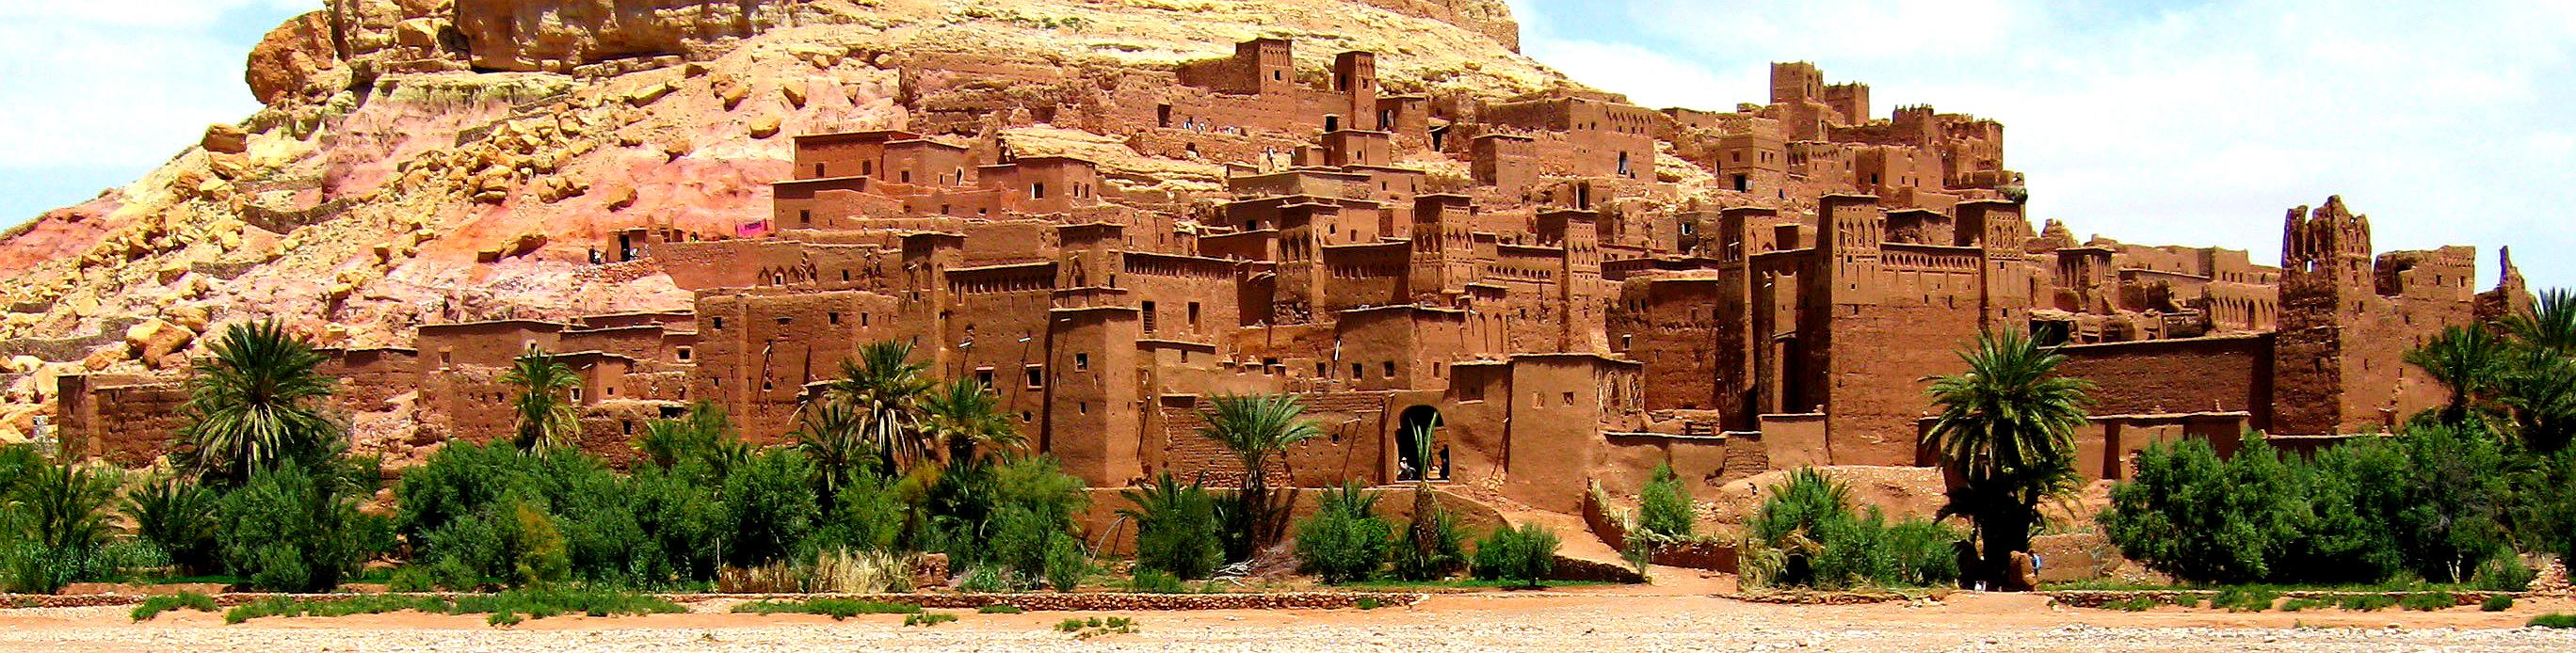 camels-at-the-kasbah-1623260_crop2